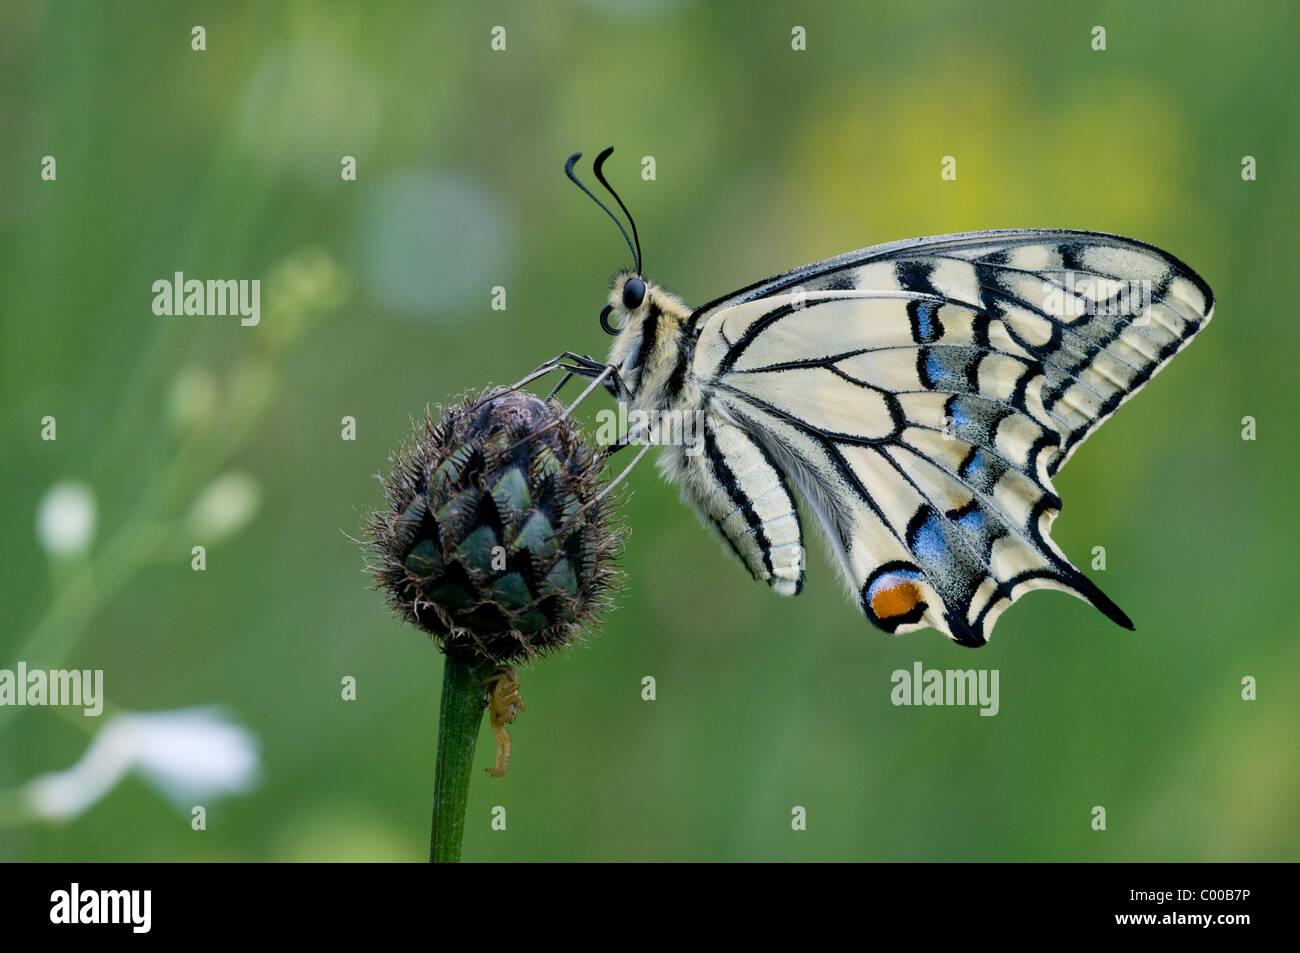 Schwalbenschwanz, Papilio machaon, Common Yellow Swallowtail - Stock Image